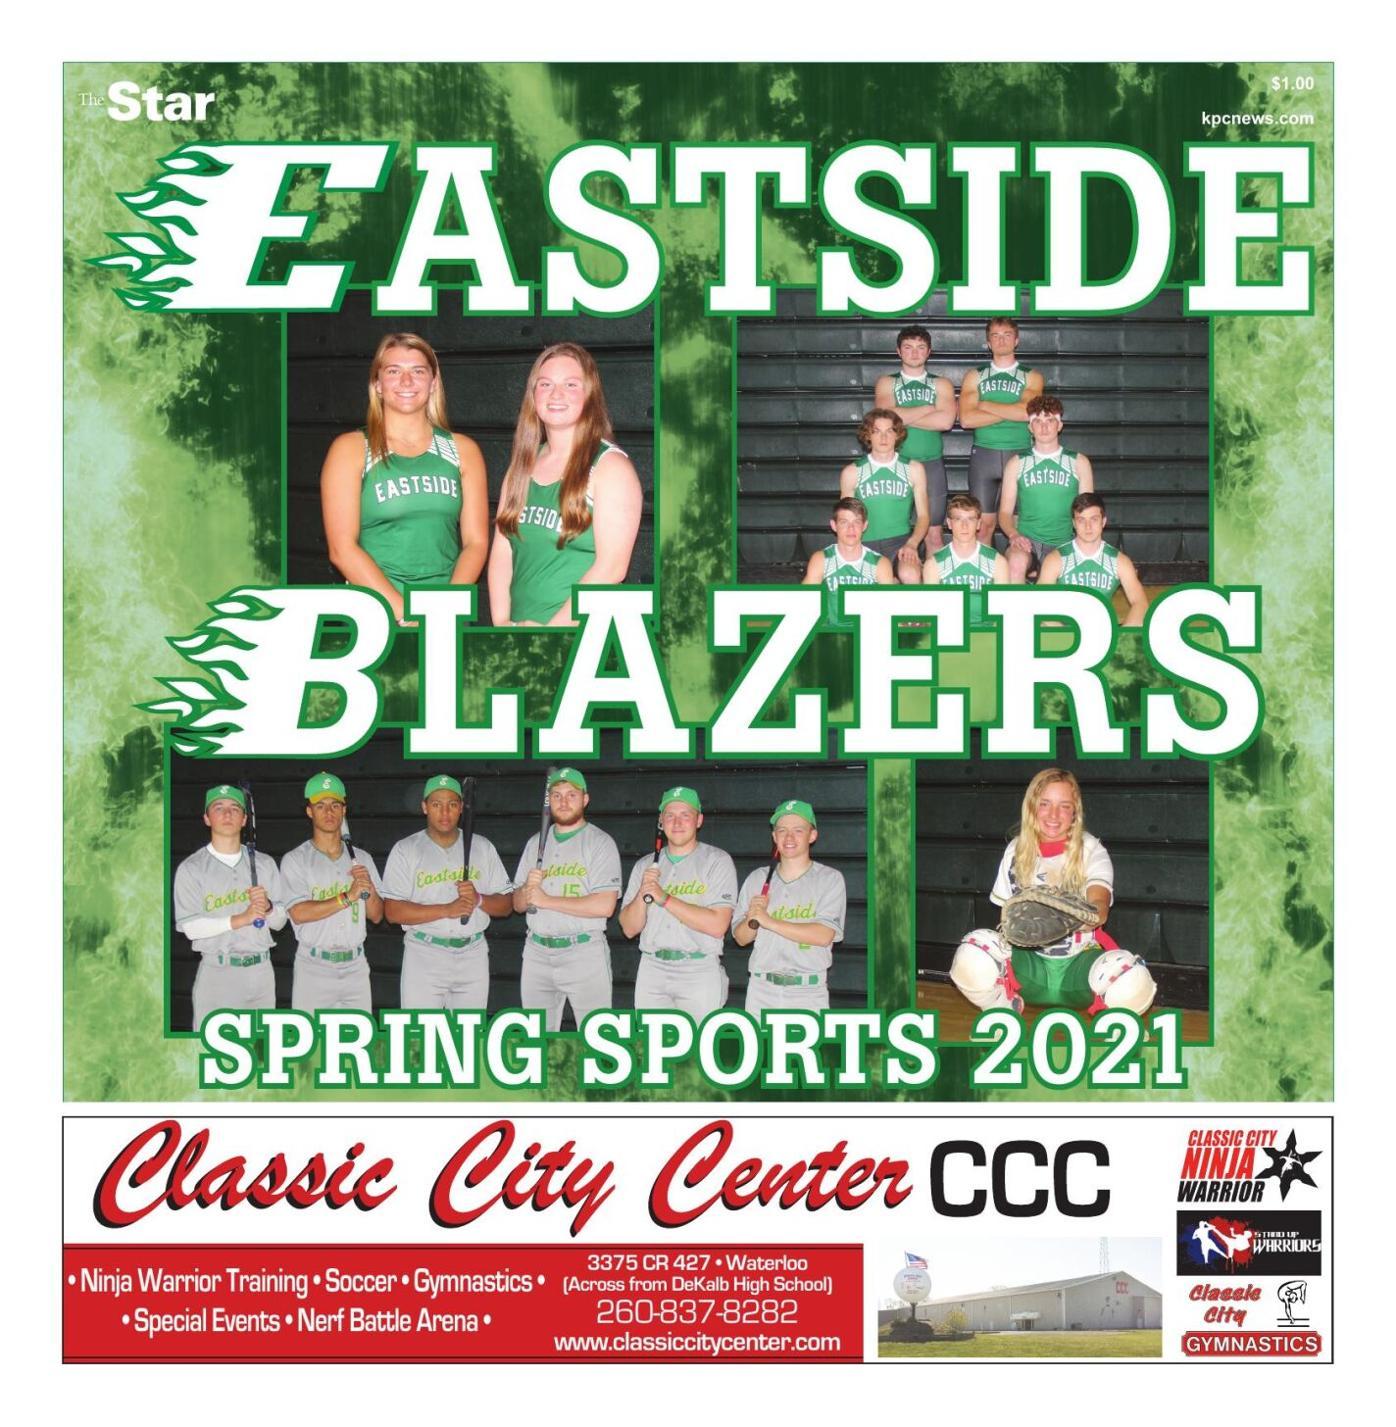 Eastside Sports Spring 2021